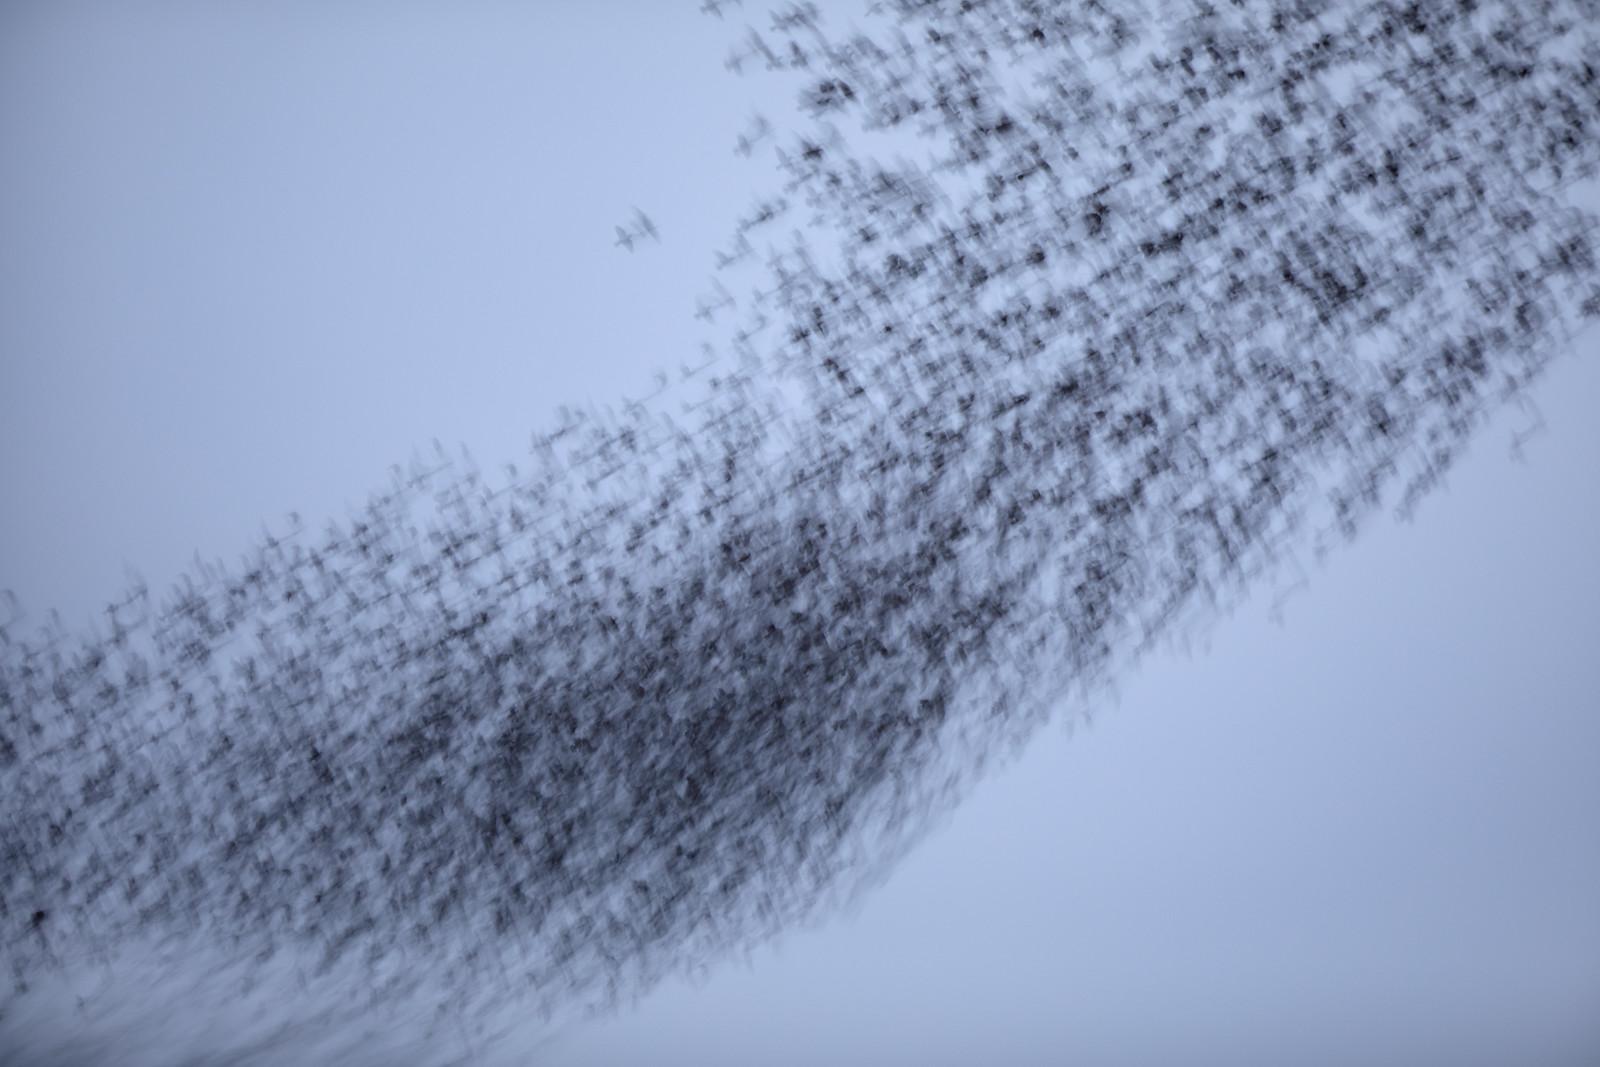 Starling Murmuration - Motion Blur - Minimal